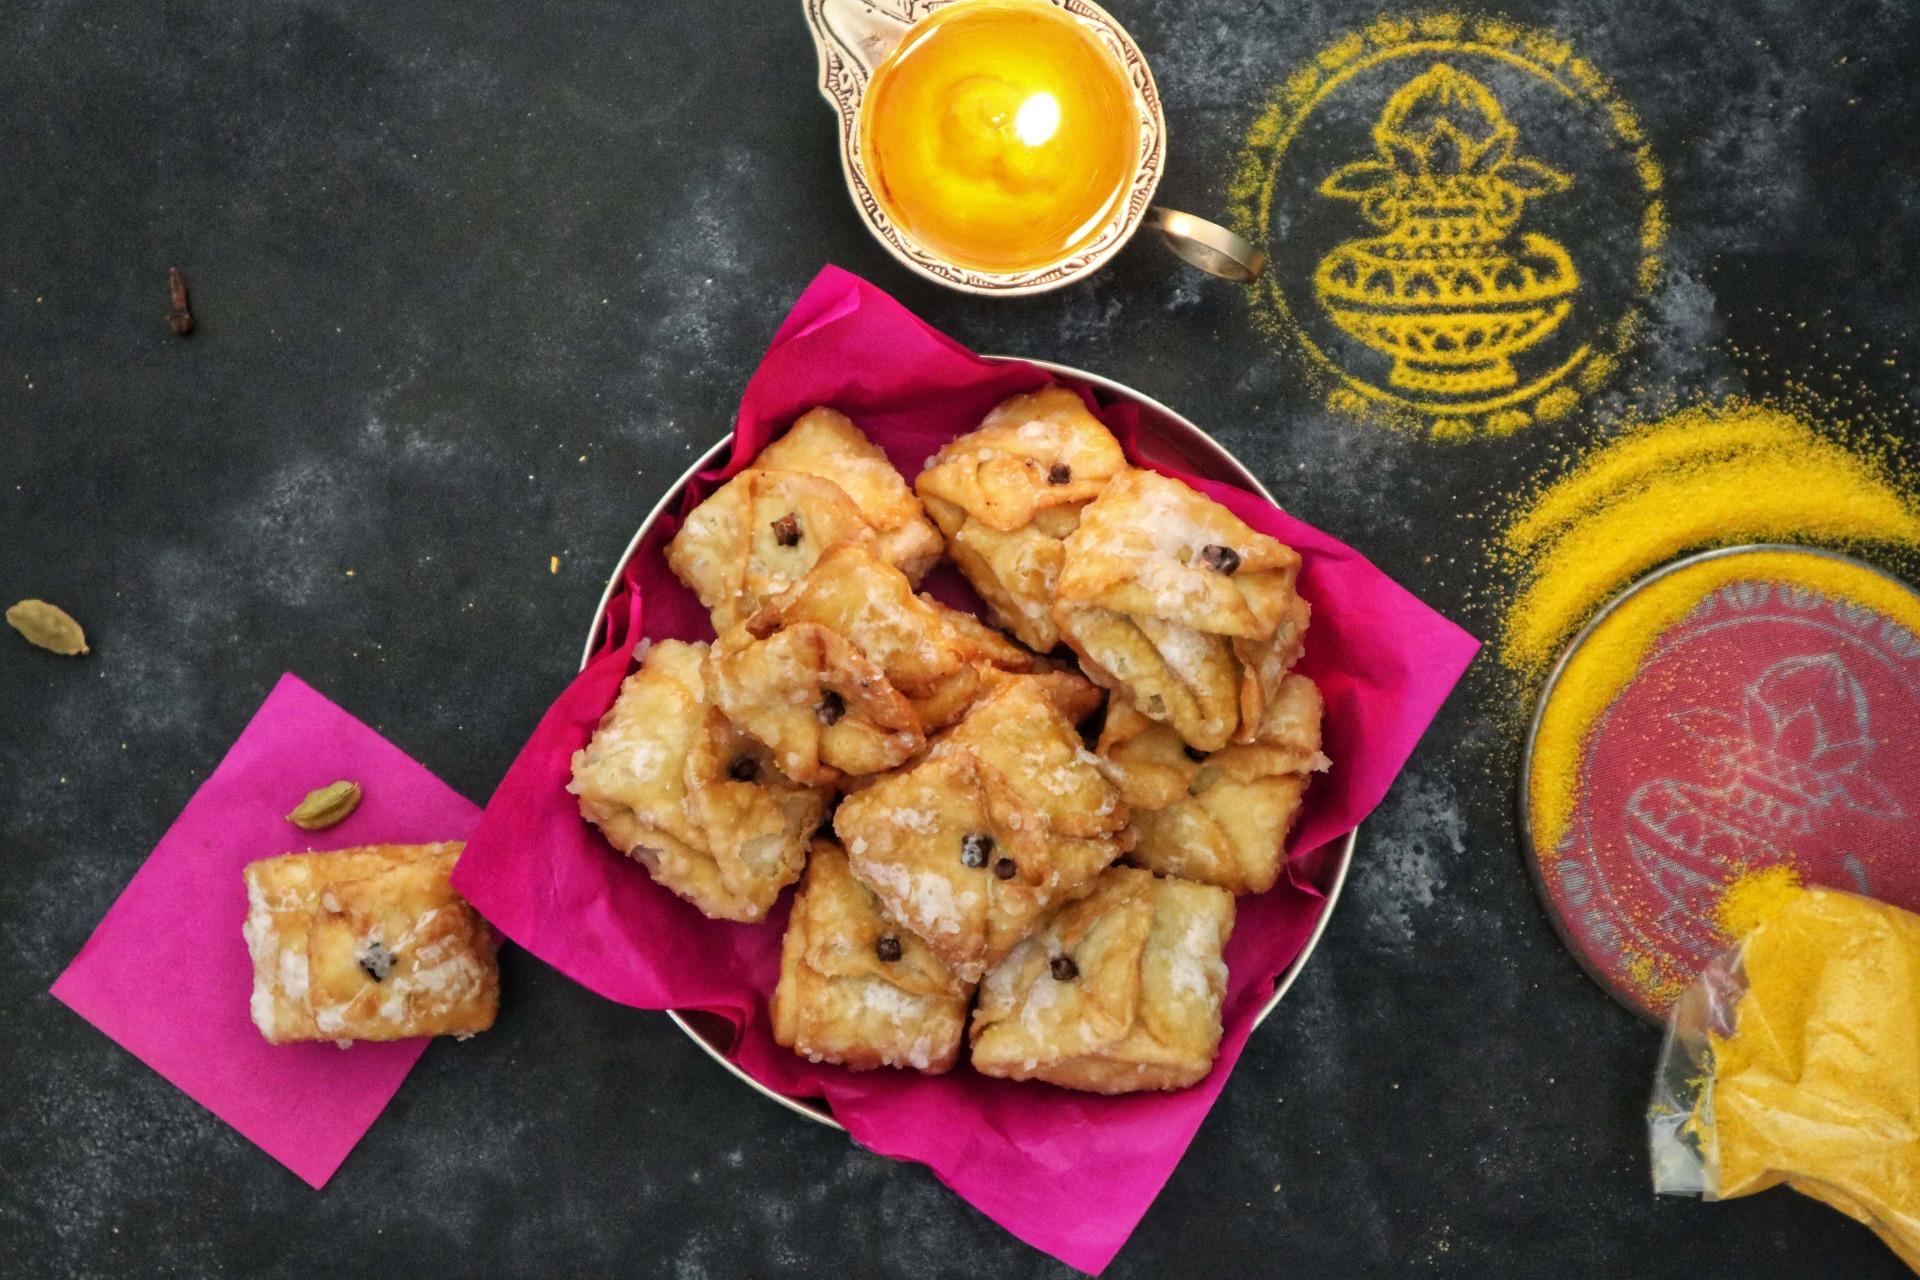 fromthecornertable, from the corner table, labanga latika, labangalatika, clove, sweet, mithai, mawa, mishti, bengalisweet, bengali sweet